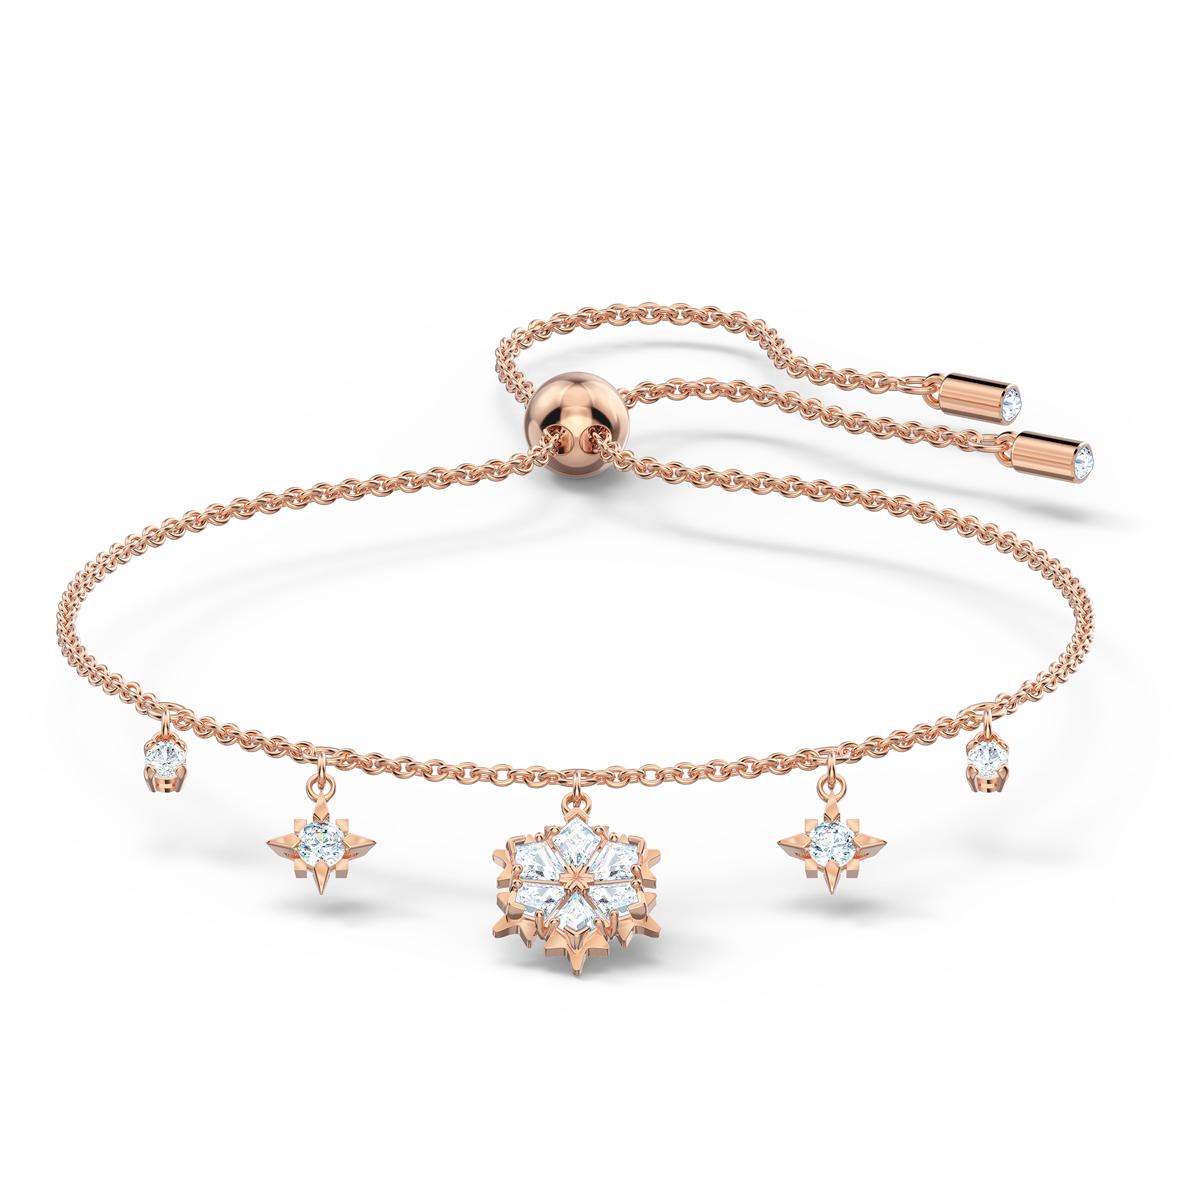 Swarovski Magic Bracelet, White, Rose Gold Tone Plated